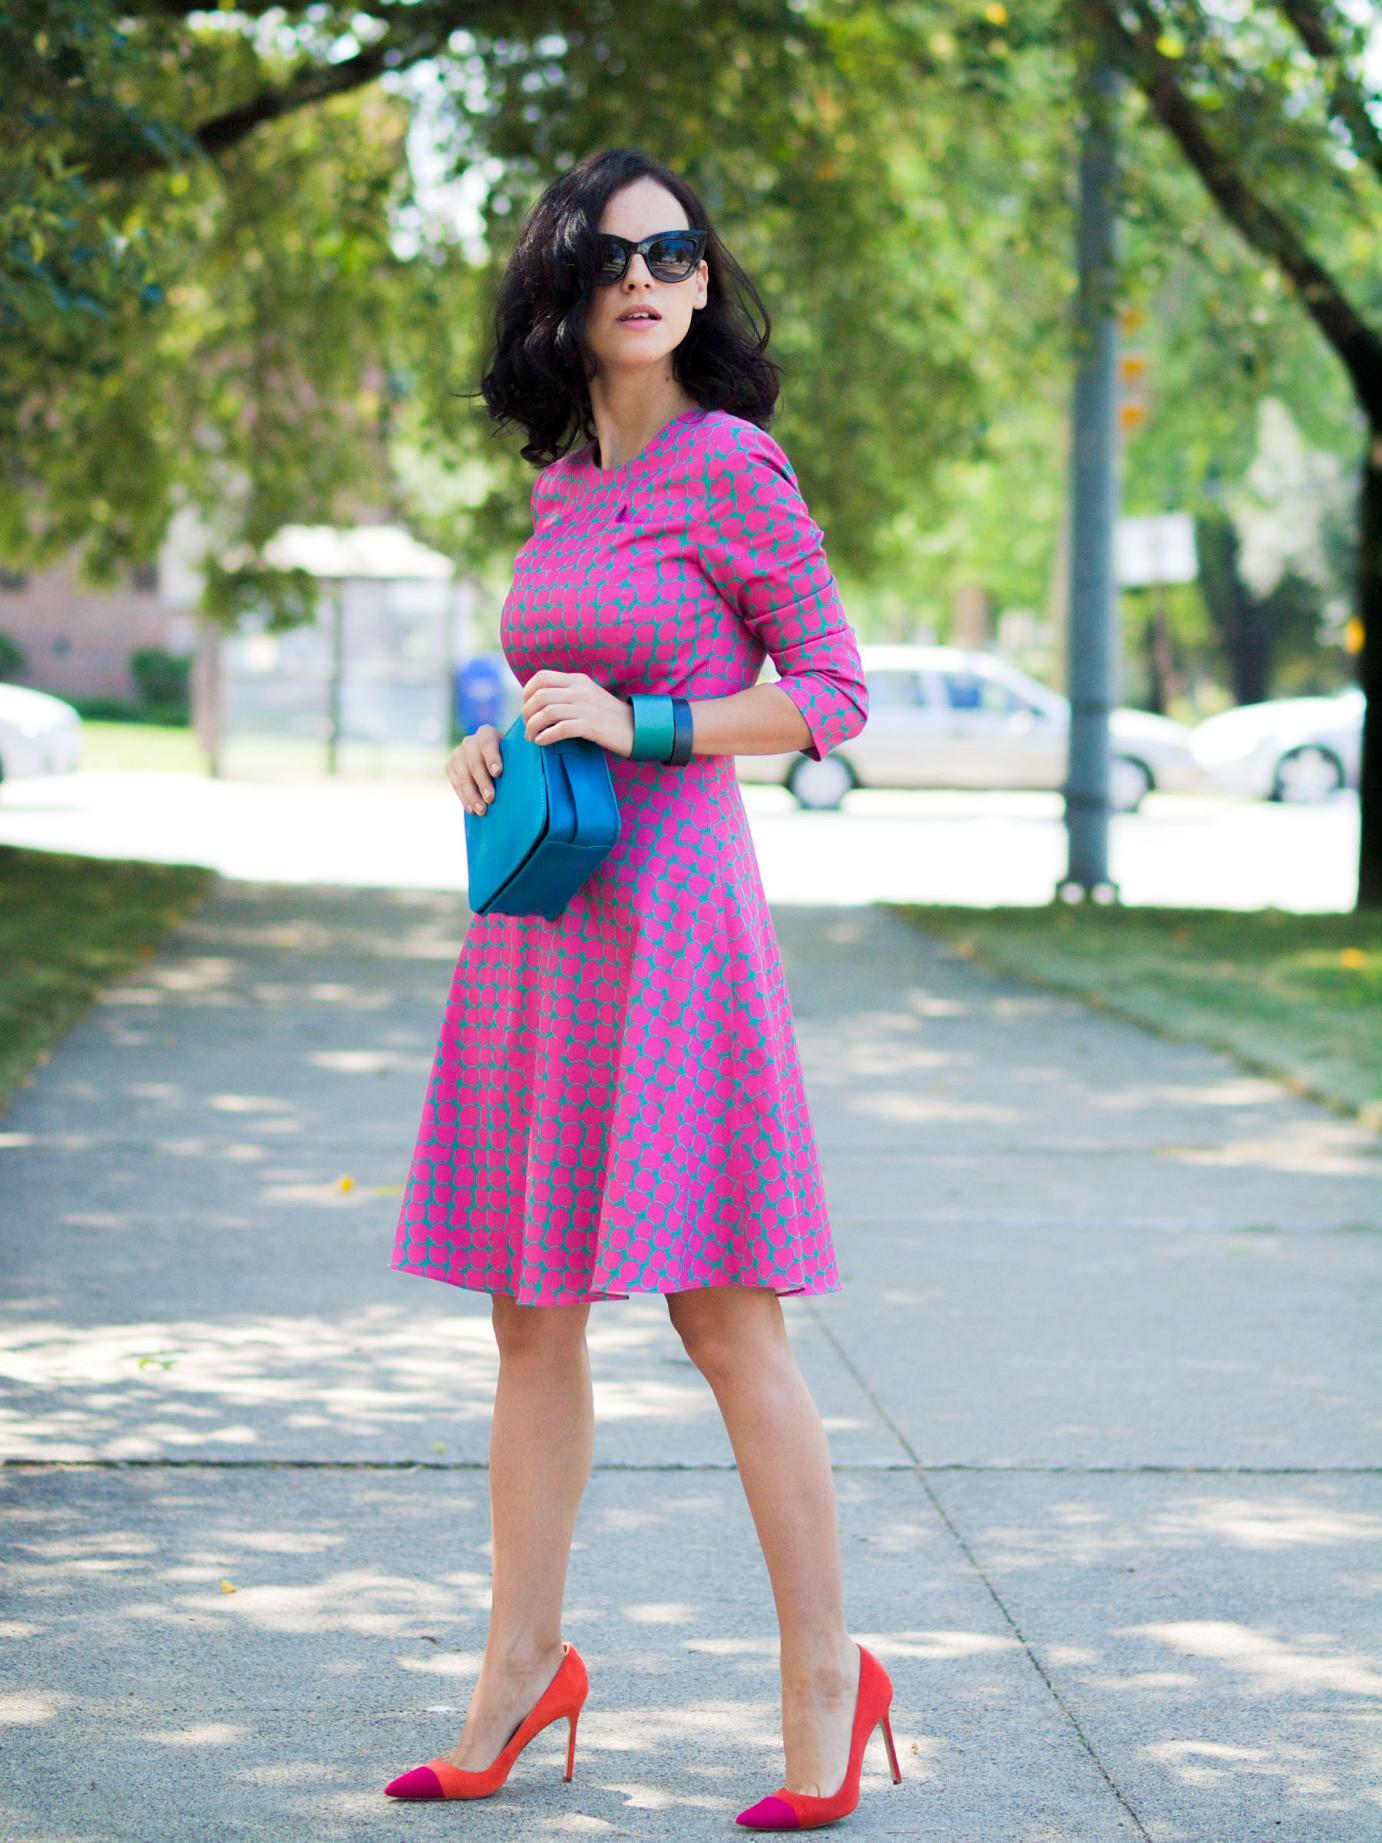 bittersweet colours, giveaway, pink dress, piol dress, cooee jewelry, asos sunglasses, manolo blahnik, printed dress, street style, feminine style, colors